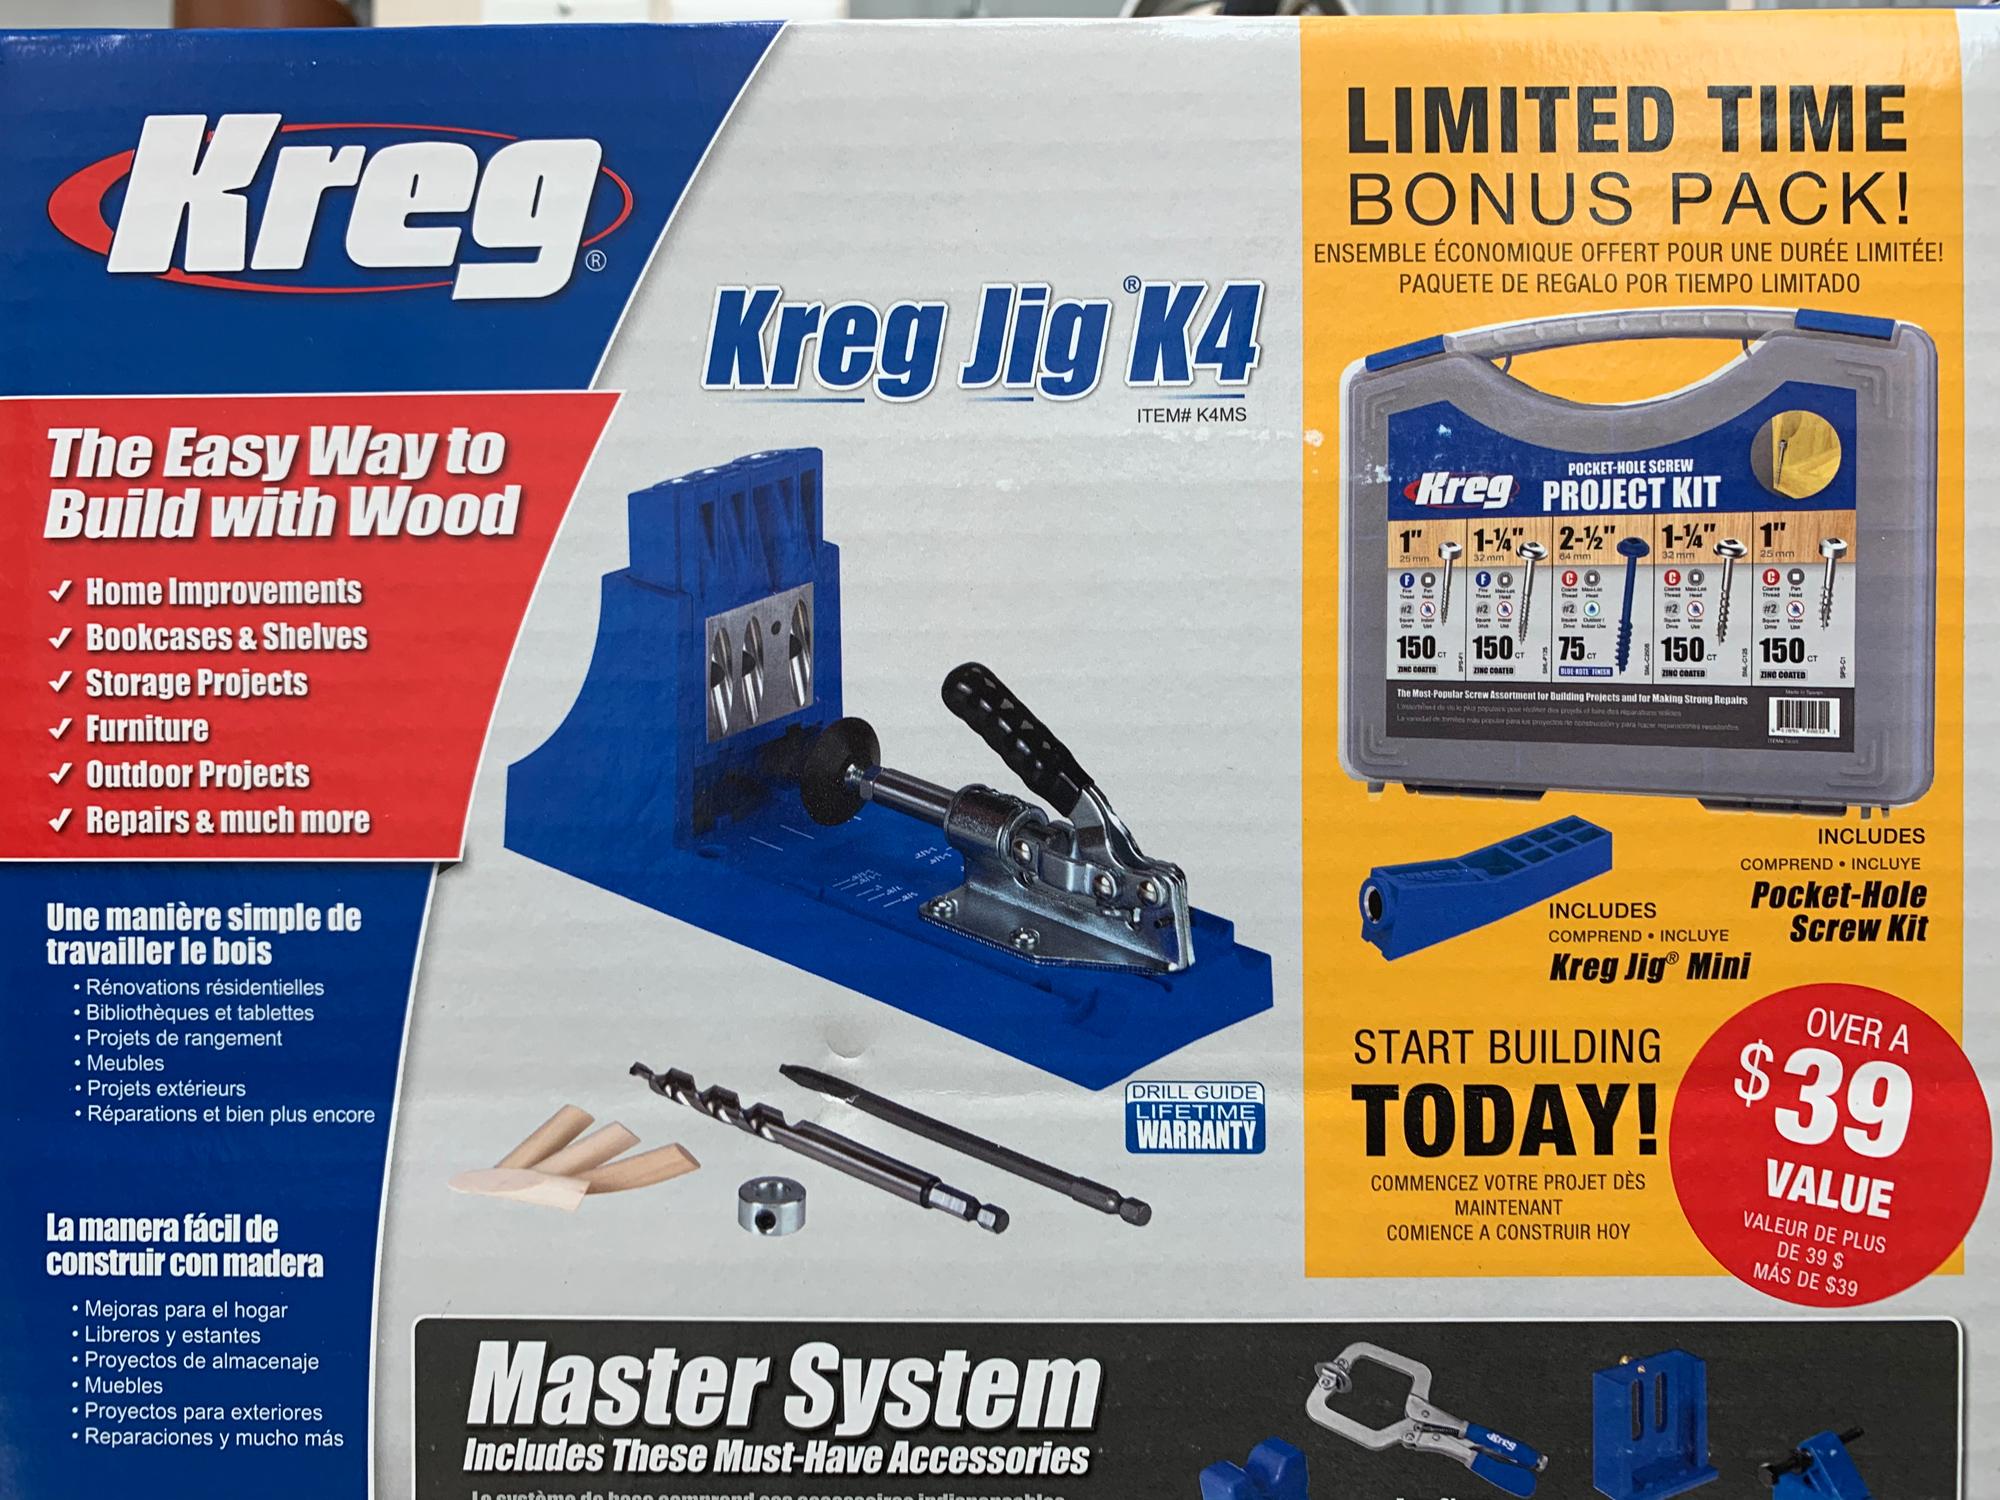 Kreg K4 Pocket Hole Jig Master System + Bonus Pocket Hole Screw Kit + Jig Mini for $124 + tax after $15 rebate at Lowes B&M YMMV